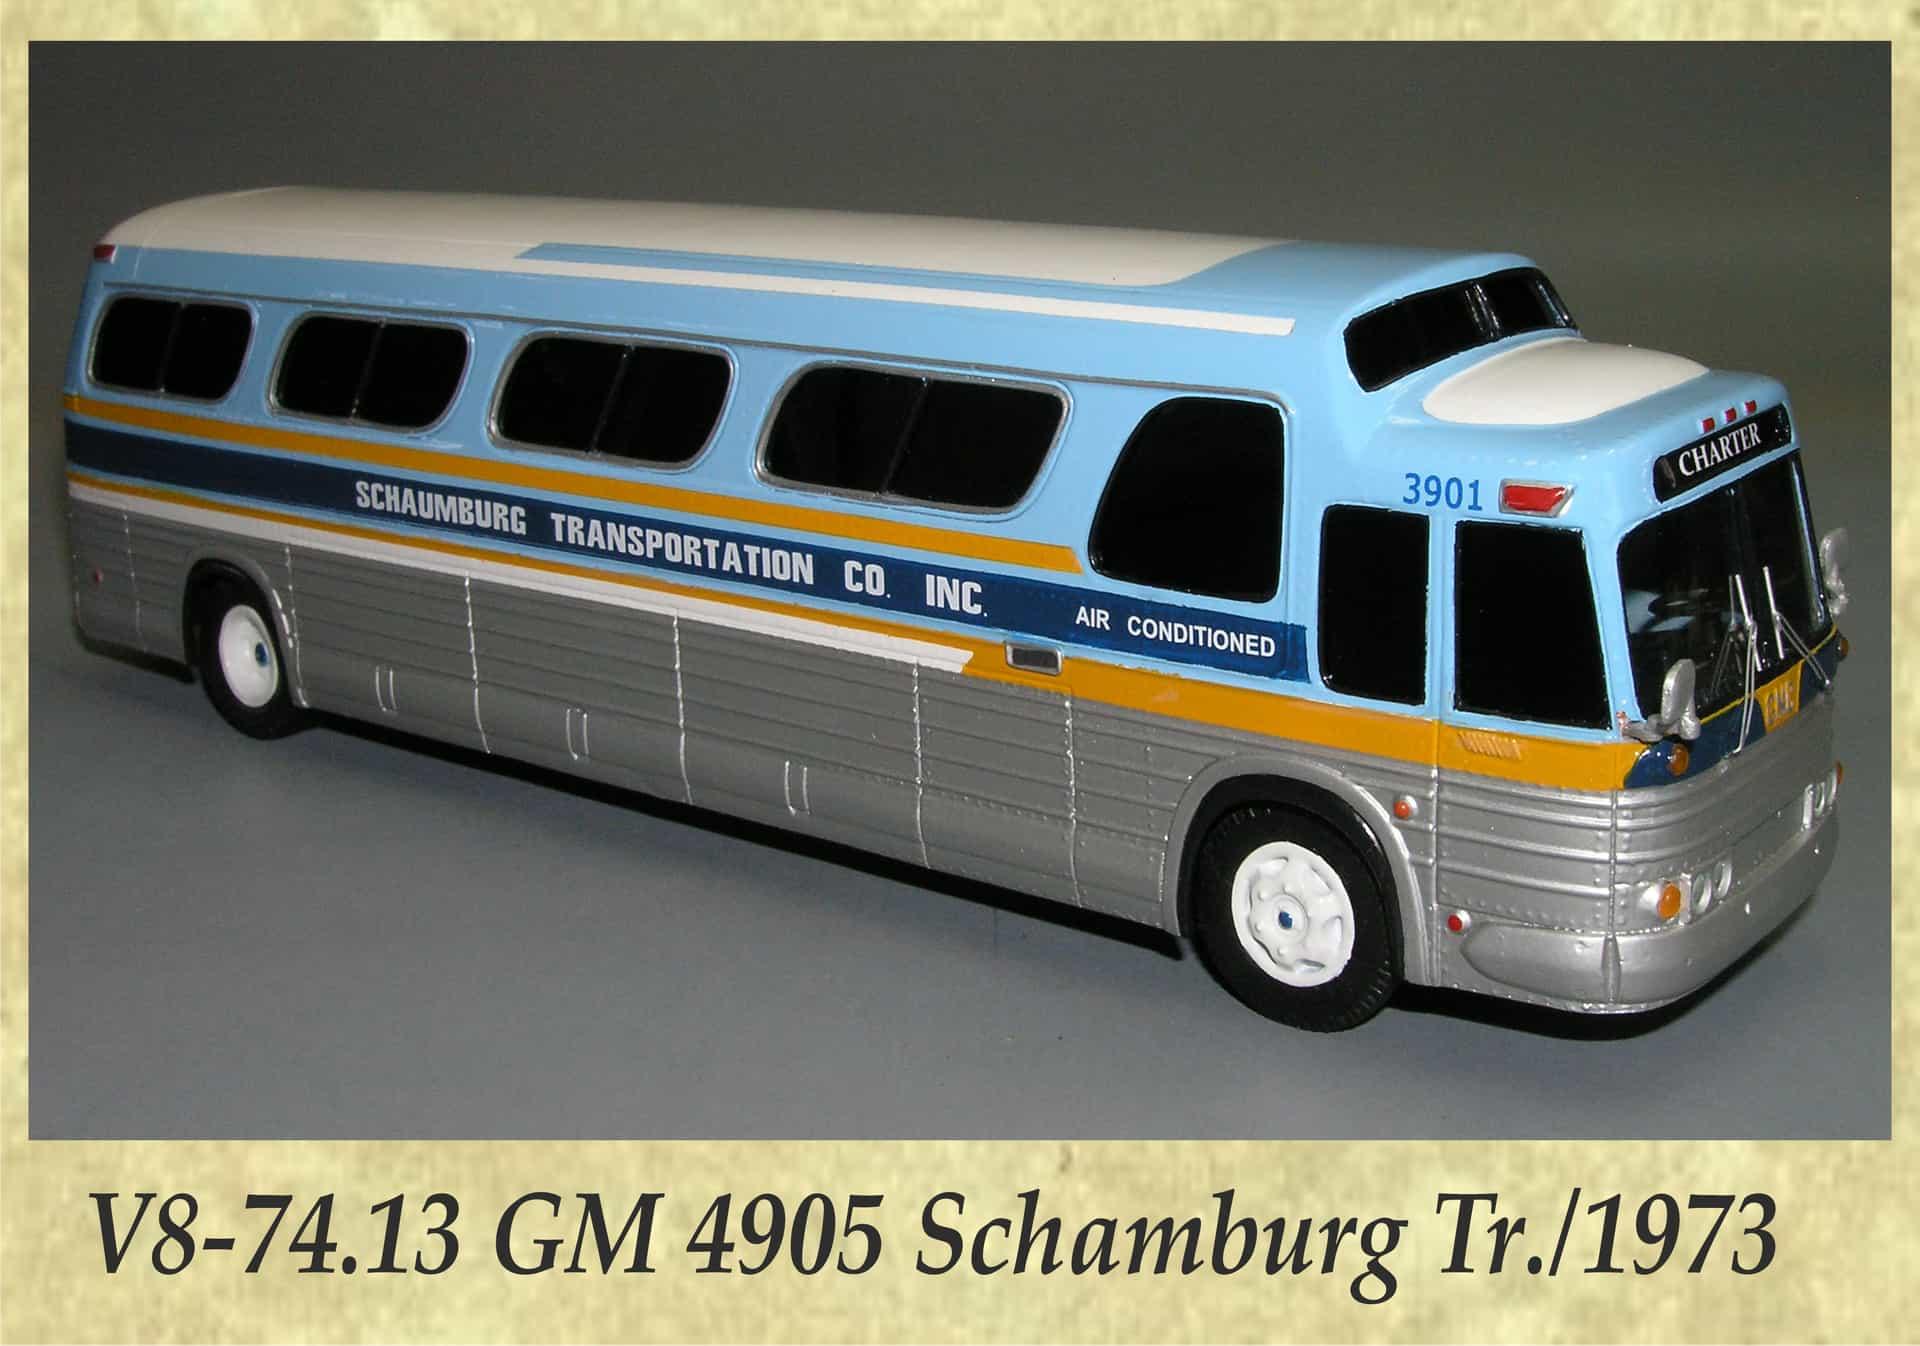 V8-74.13 GM 4905 Schamburg Tr.1973